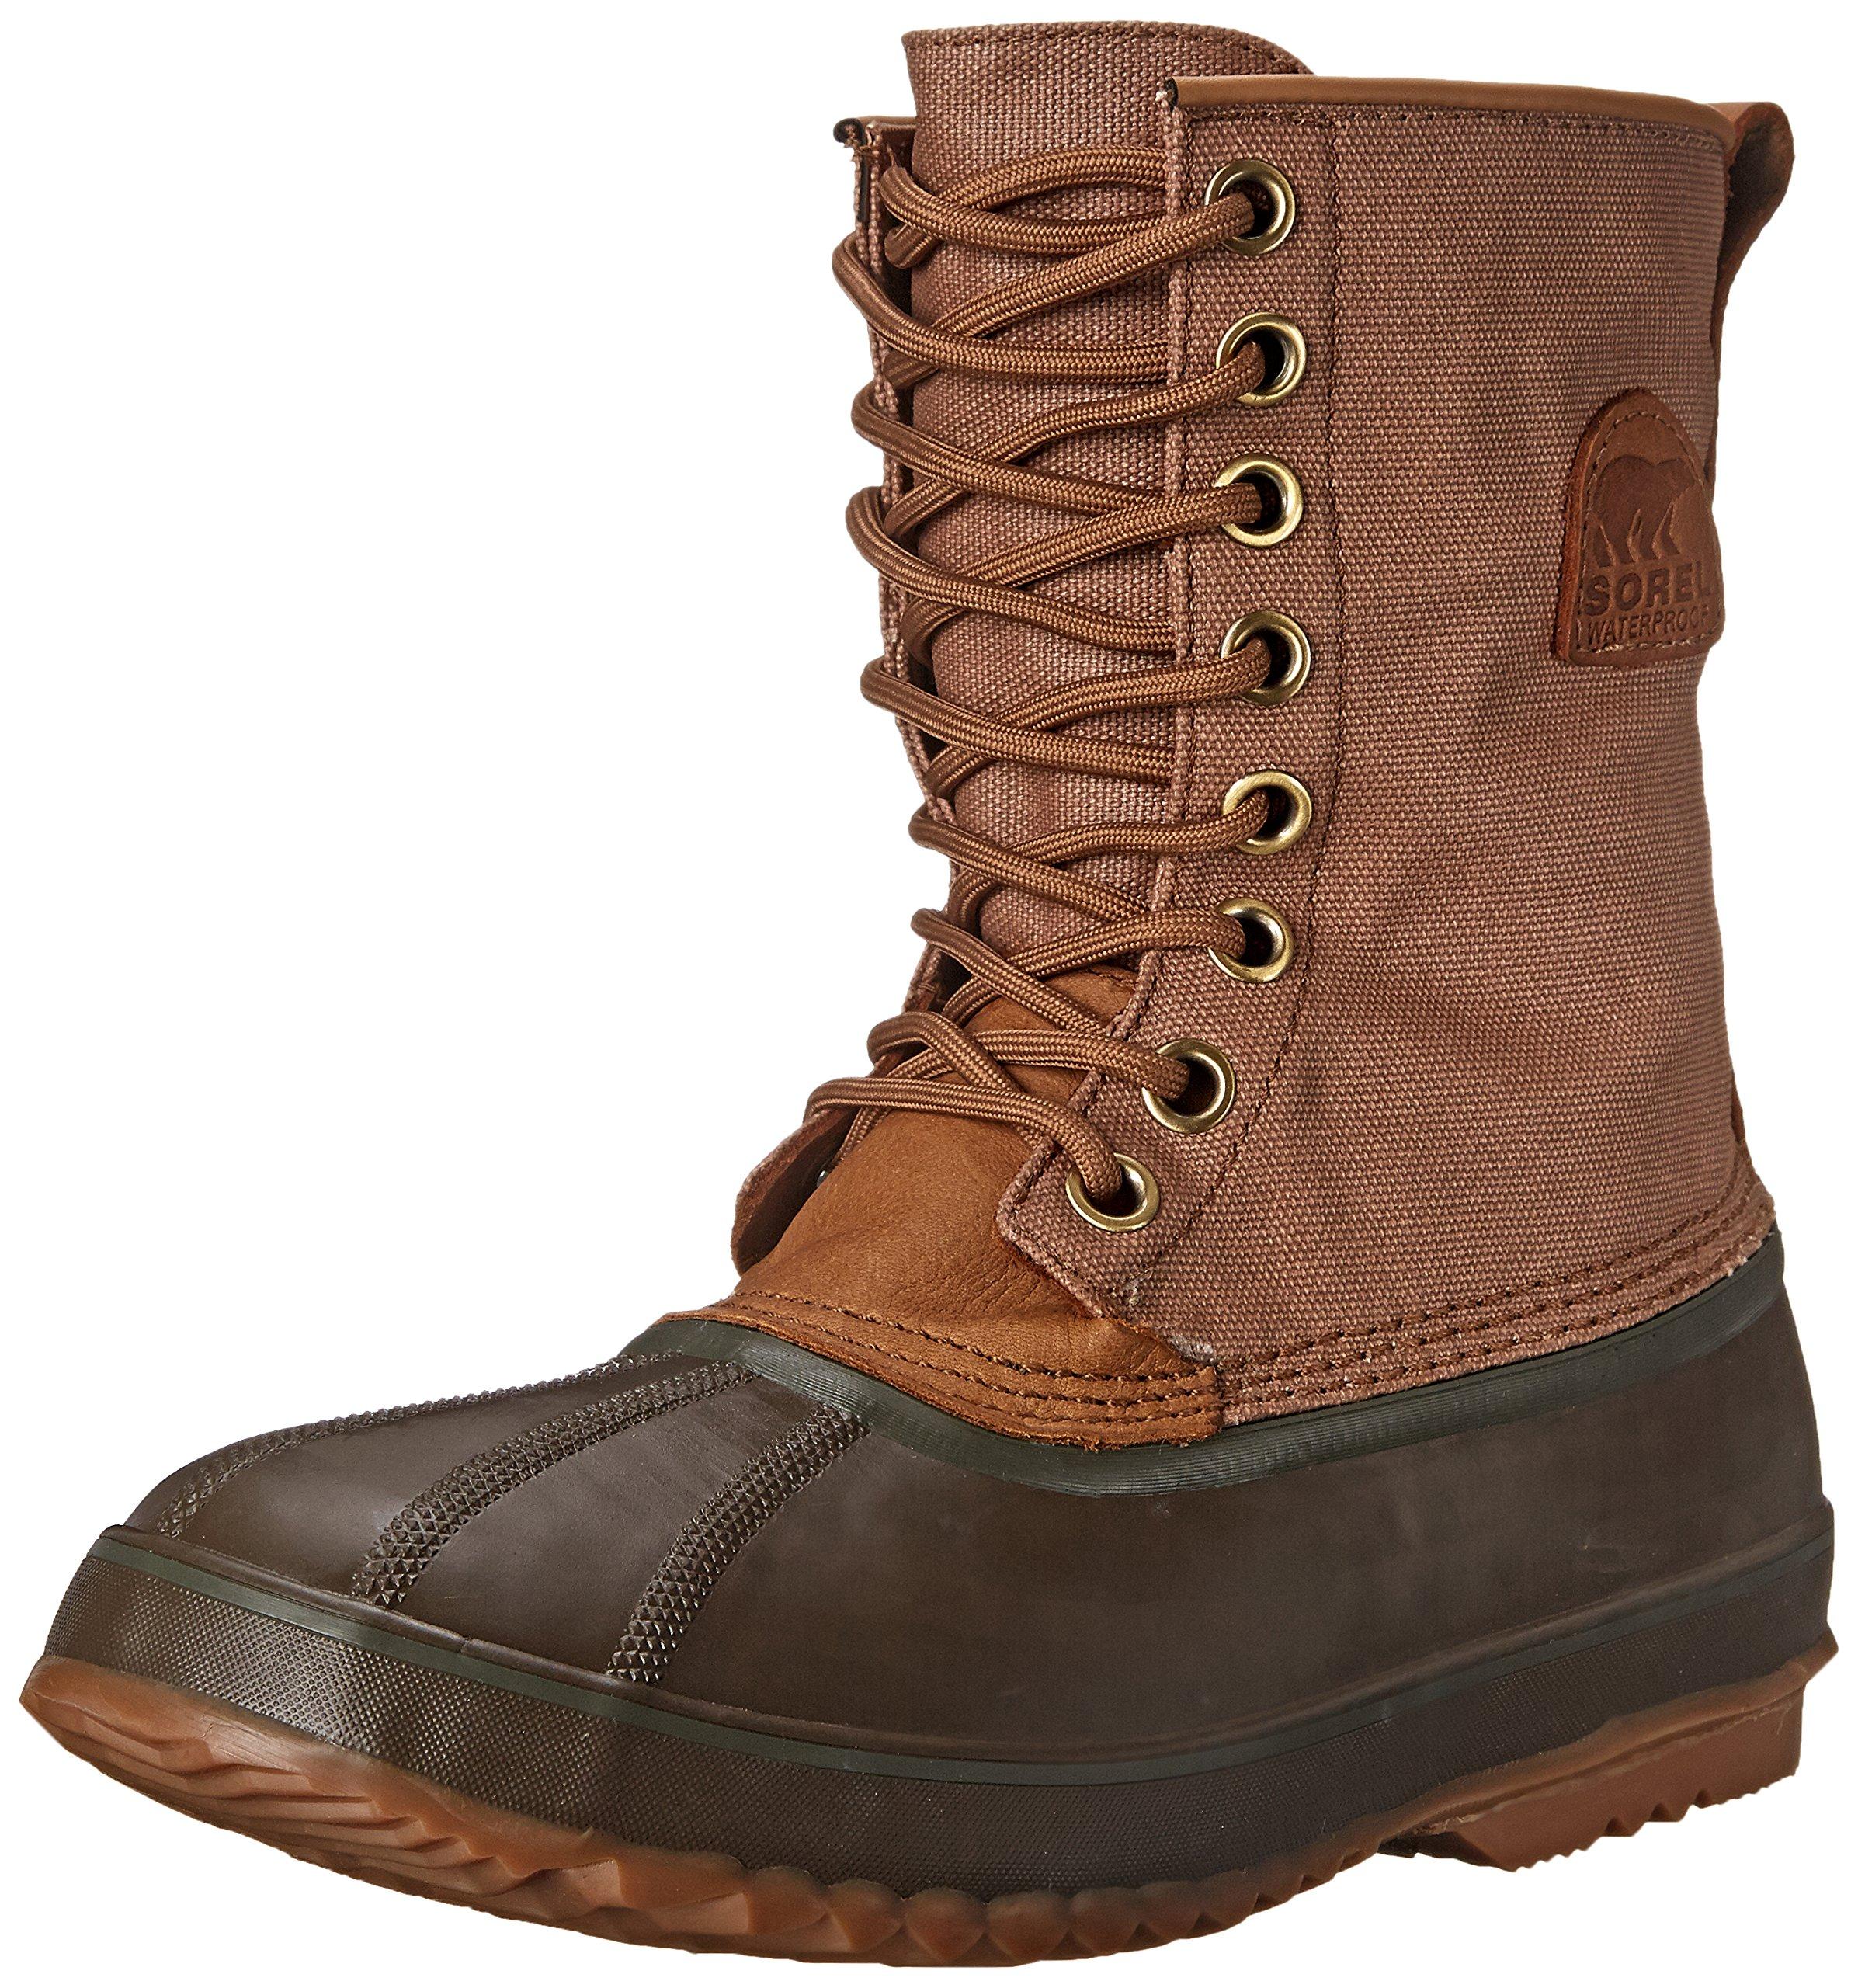 SOREL Men's 1964 Premium T CVS Boot, Peatmoss, Bright Copper, 11.5 M US by SOREL